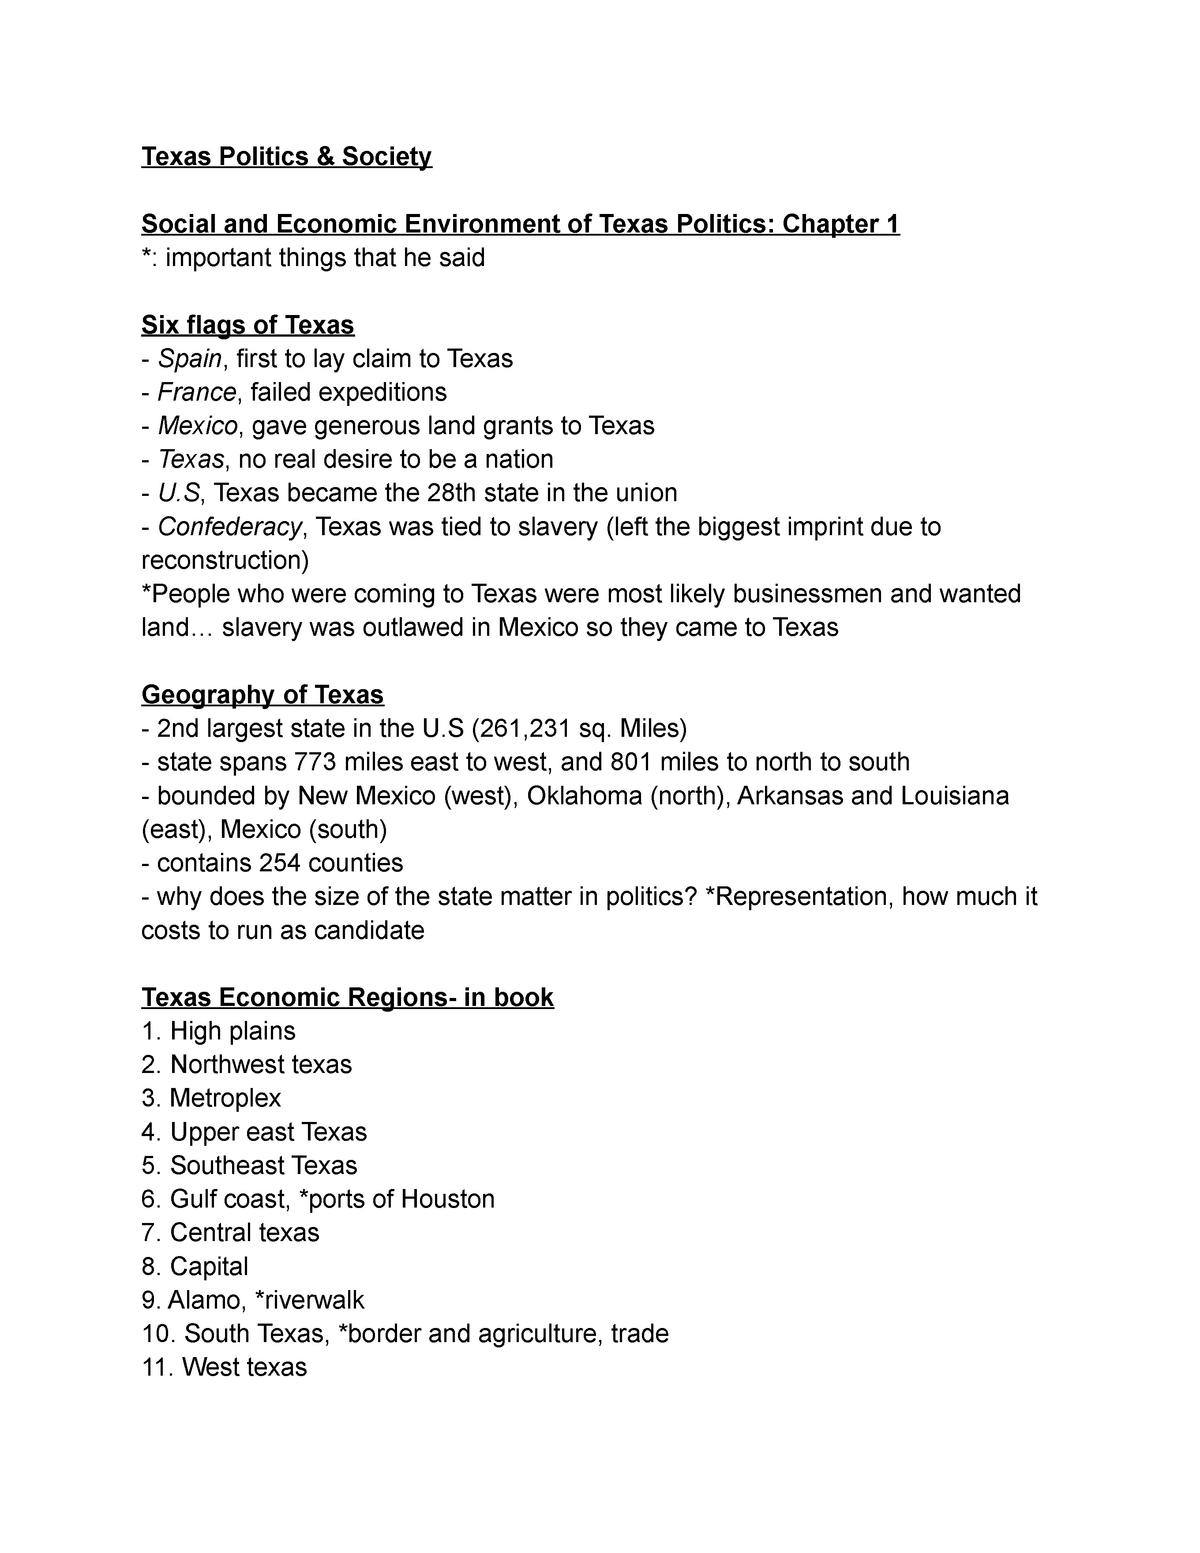 Texas Politics - Lecture notes 1 - POL 1133: Texas Politics and